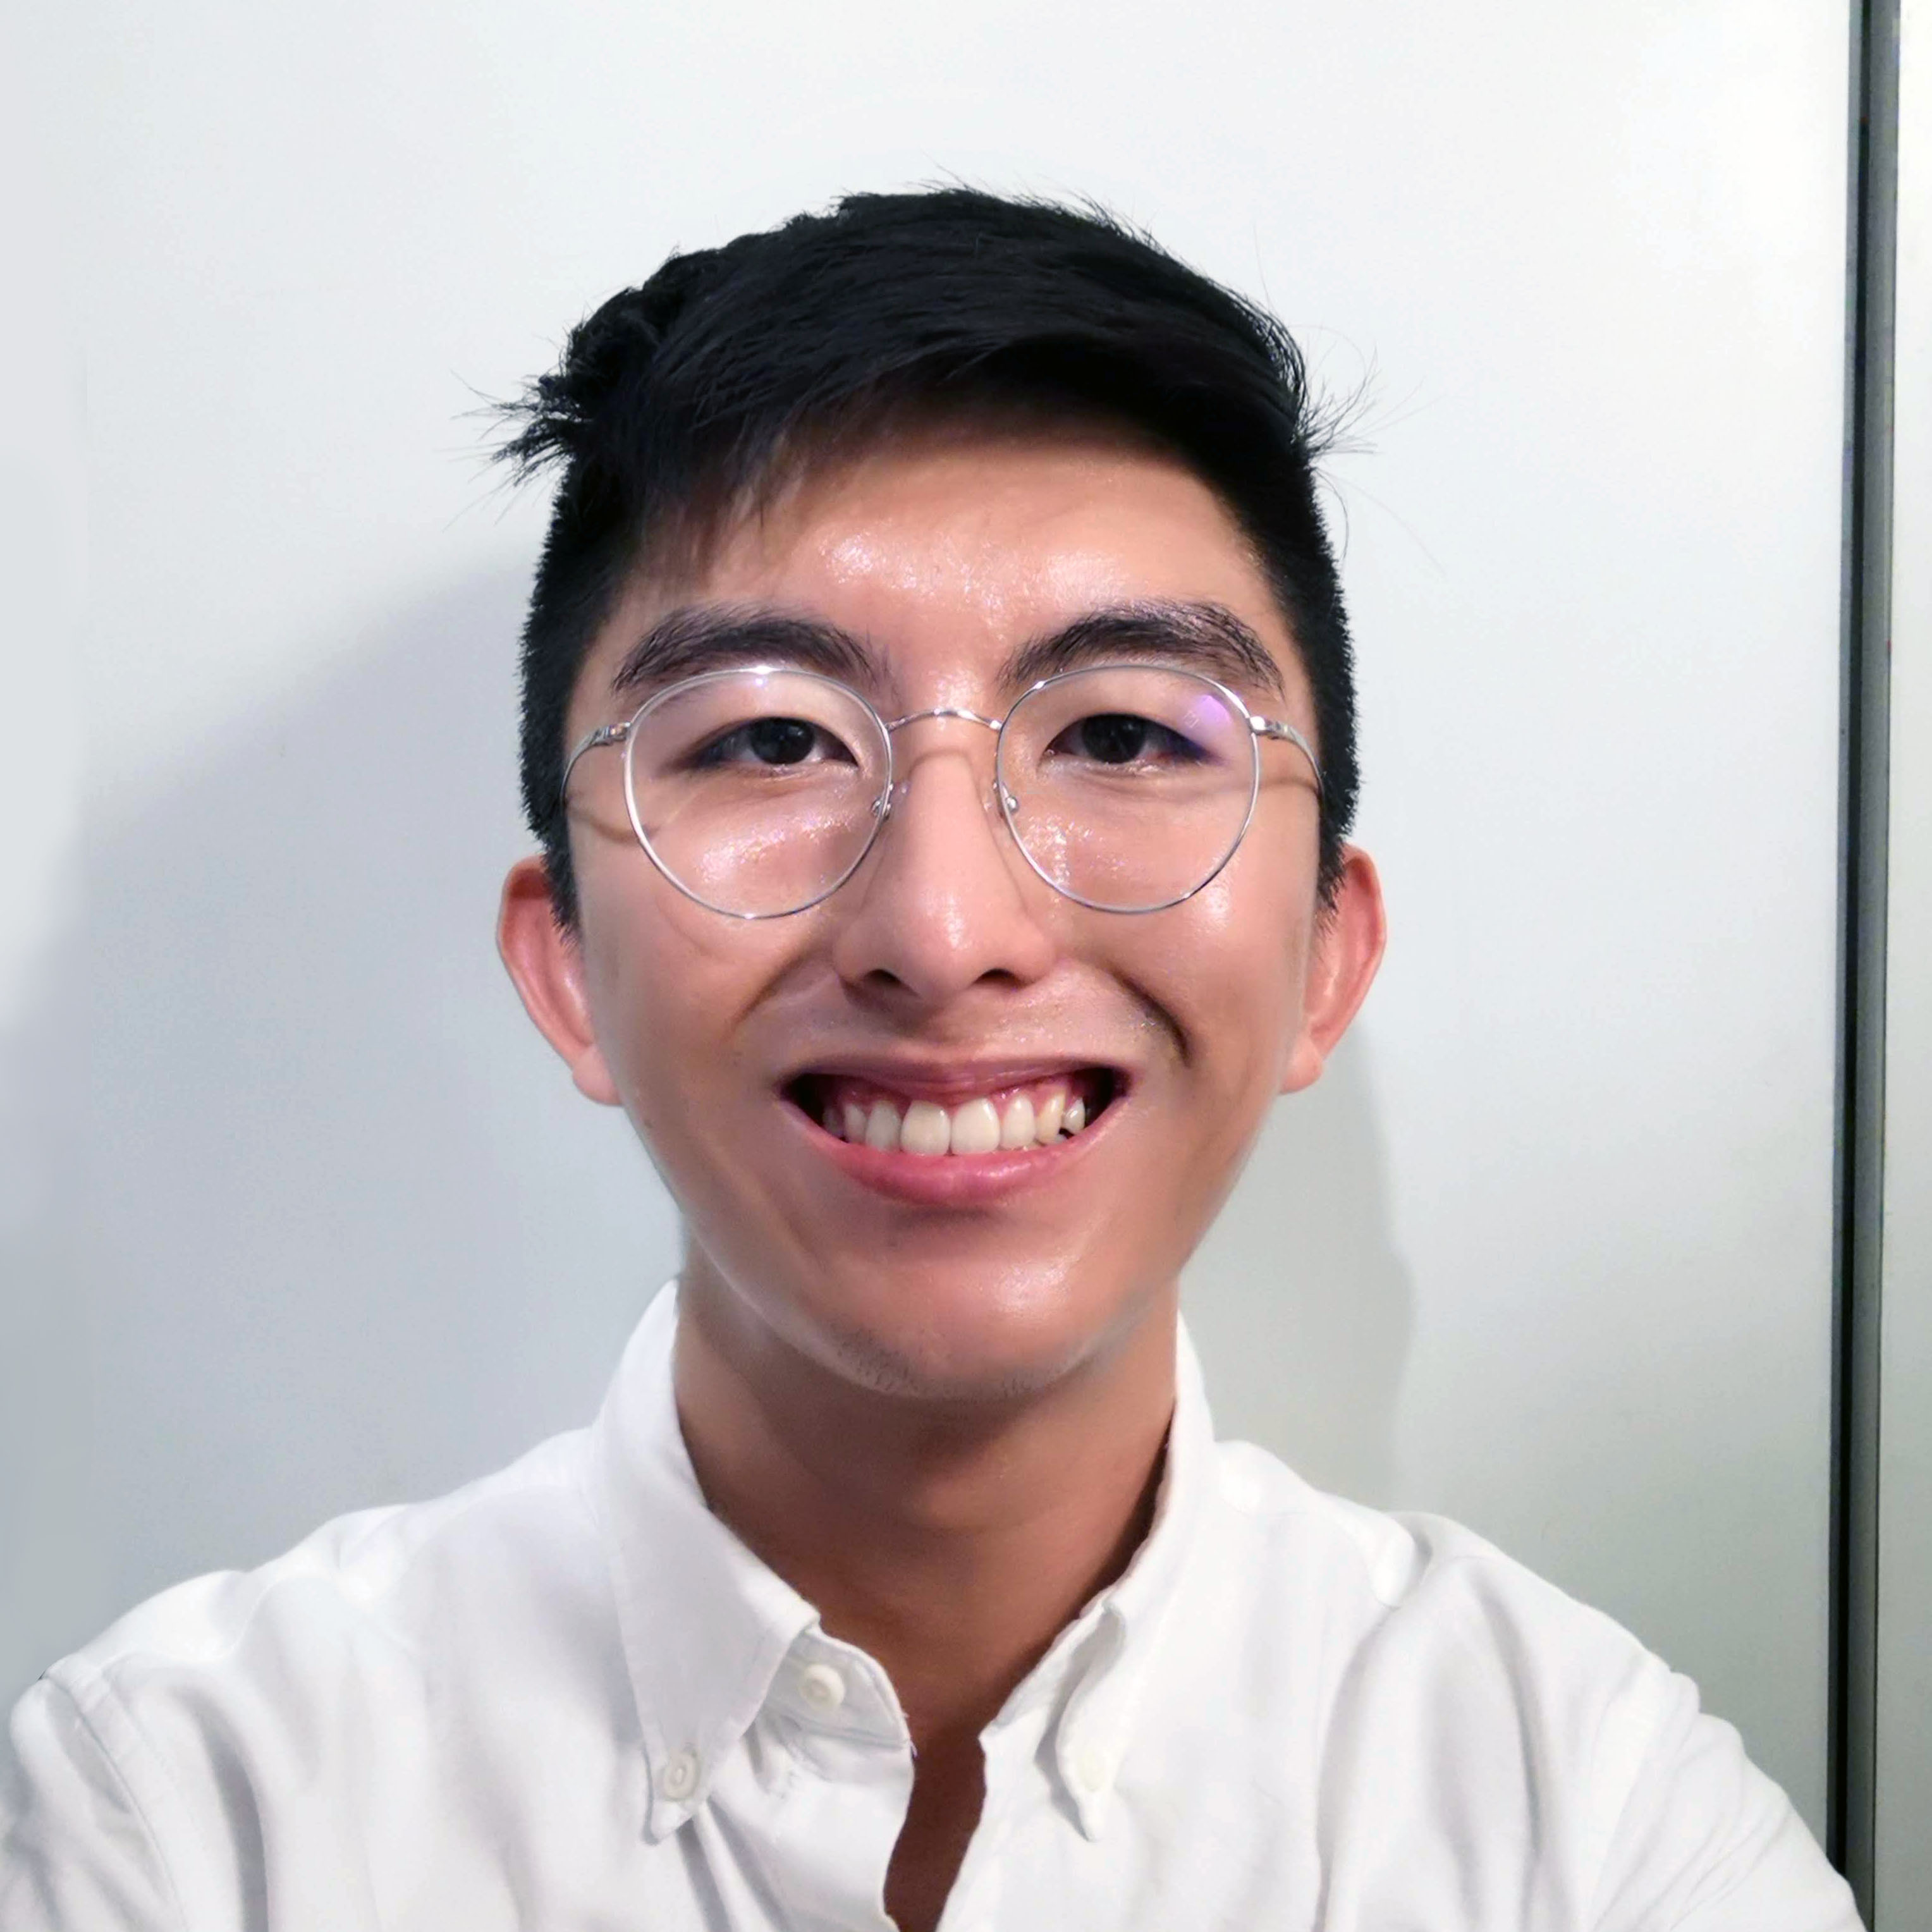 Photo of Seng Choon Chew